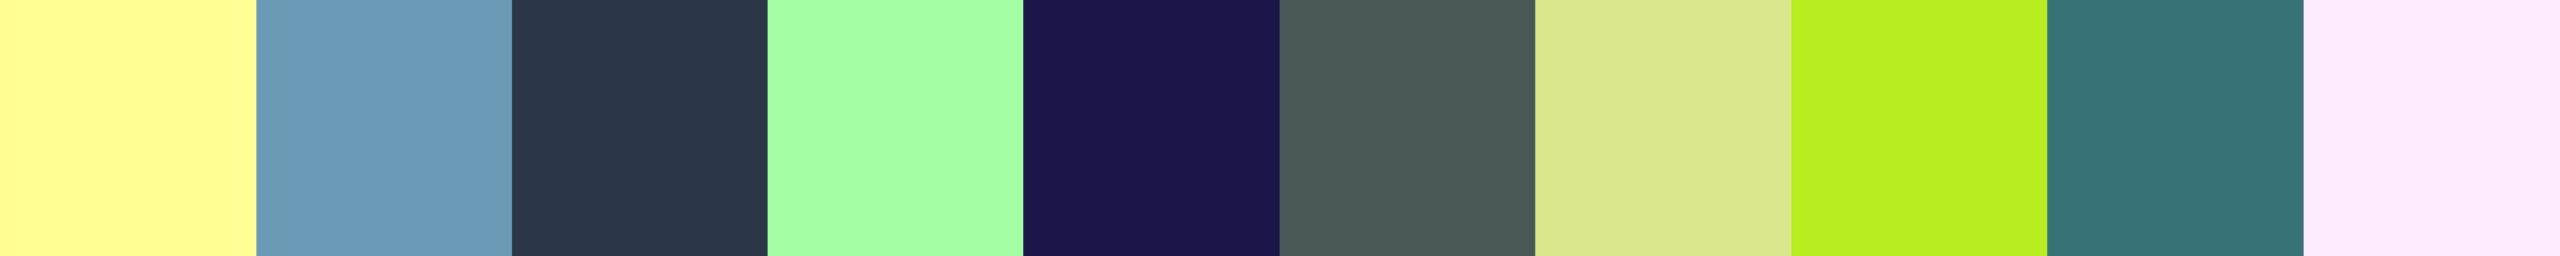 645 Hayala Color Palette